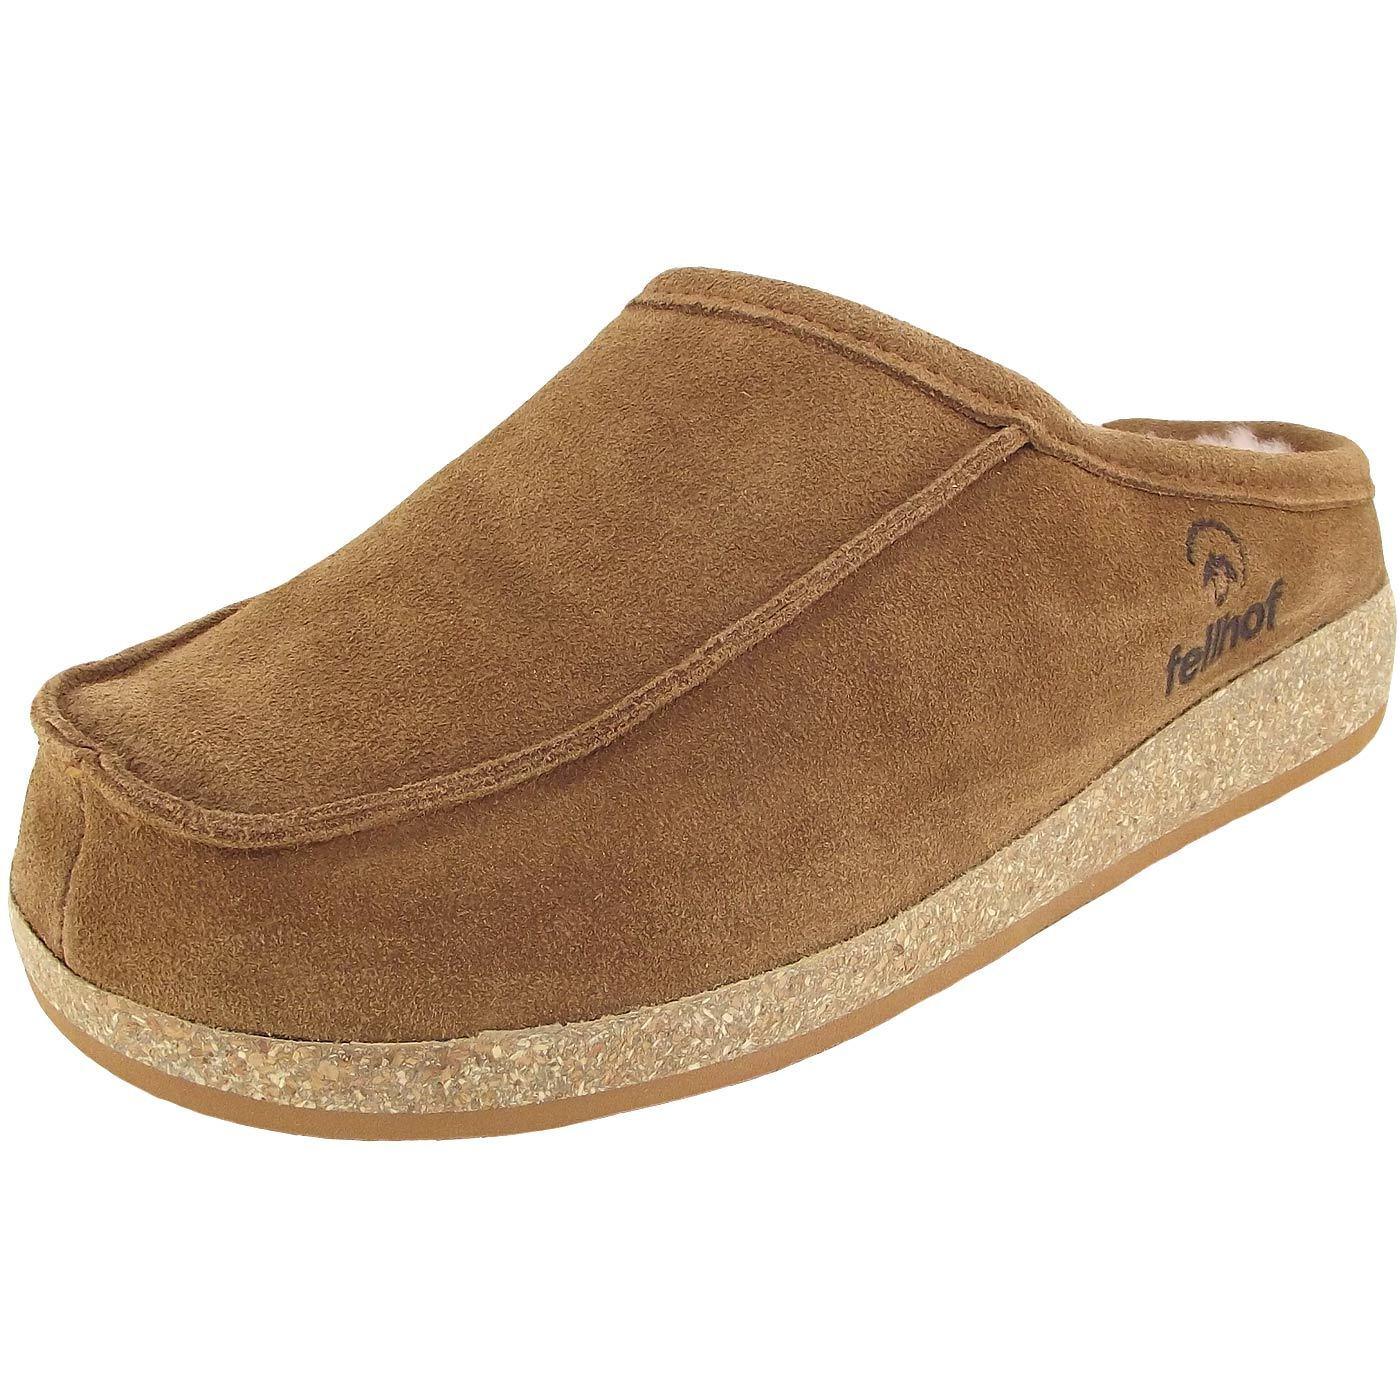 Billig hohe Qualität Fellhof Tappo Unisex Lammfell-Pantoffeln braun